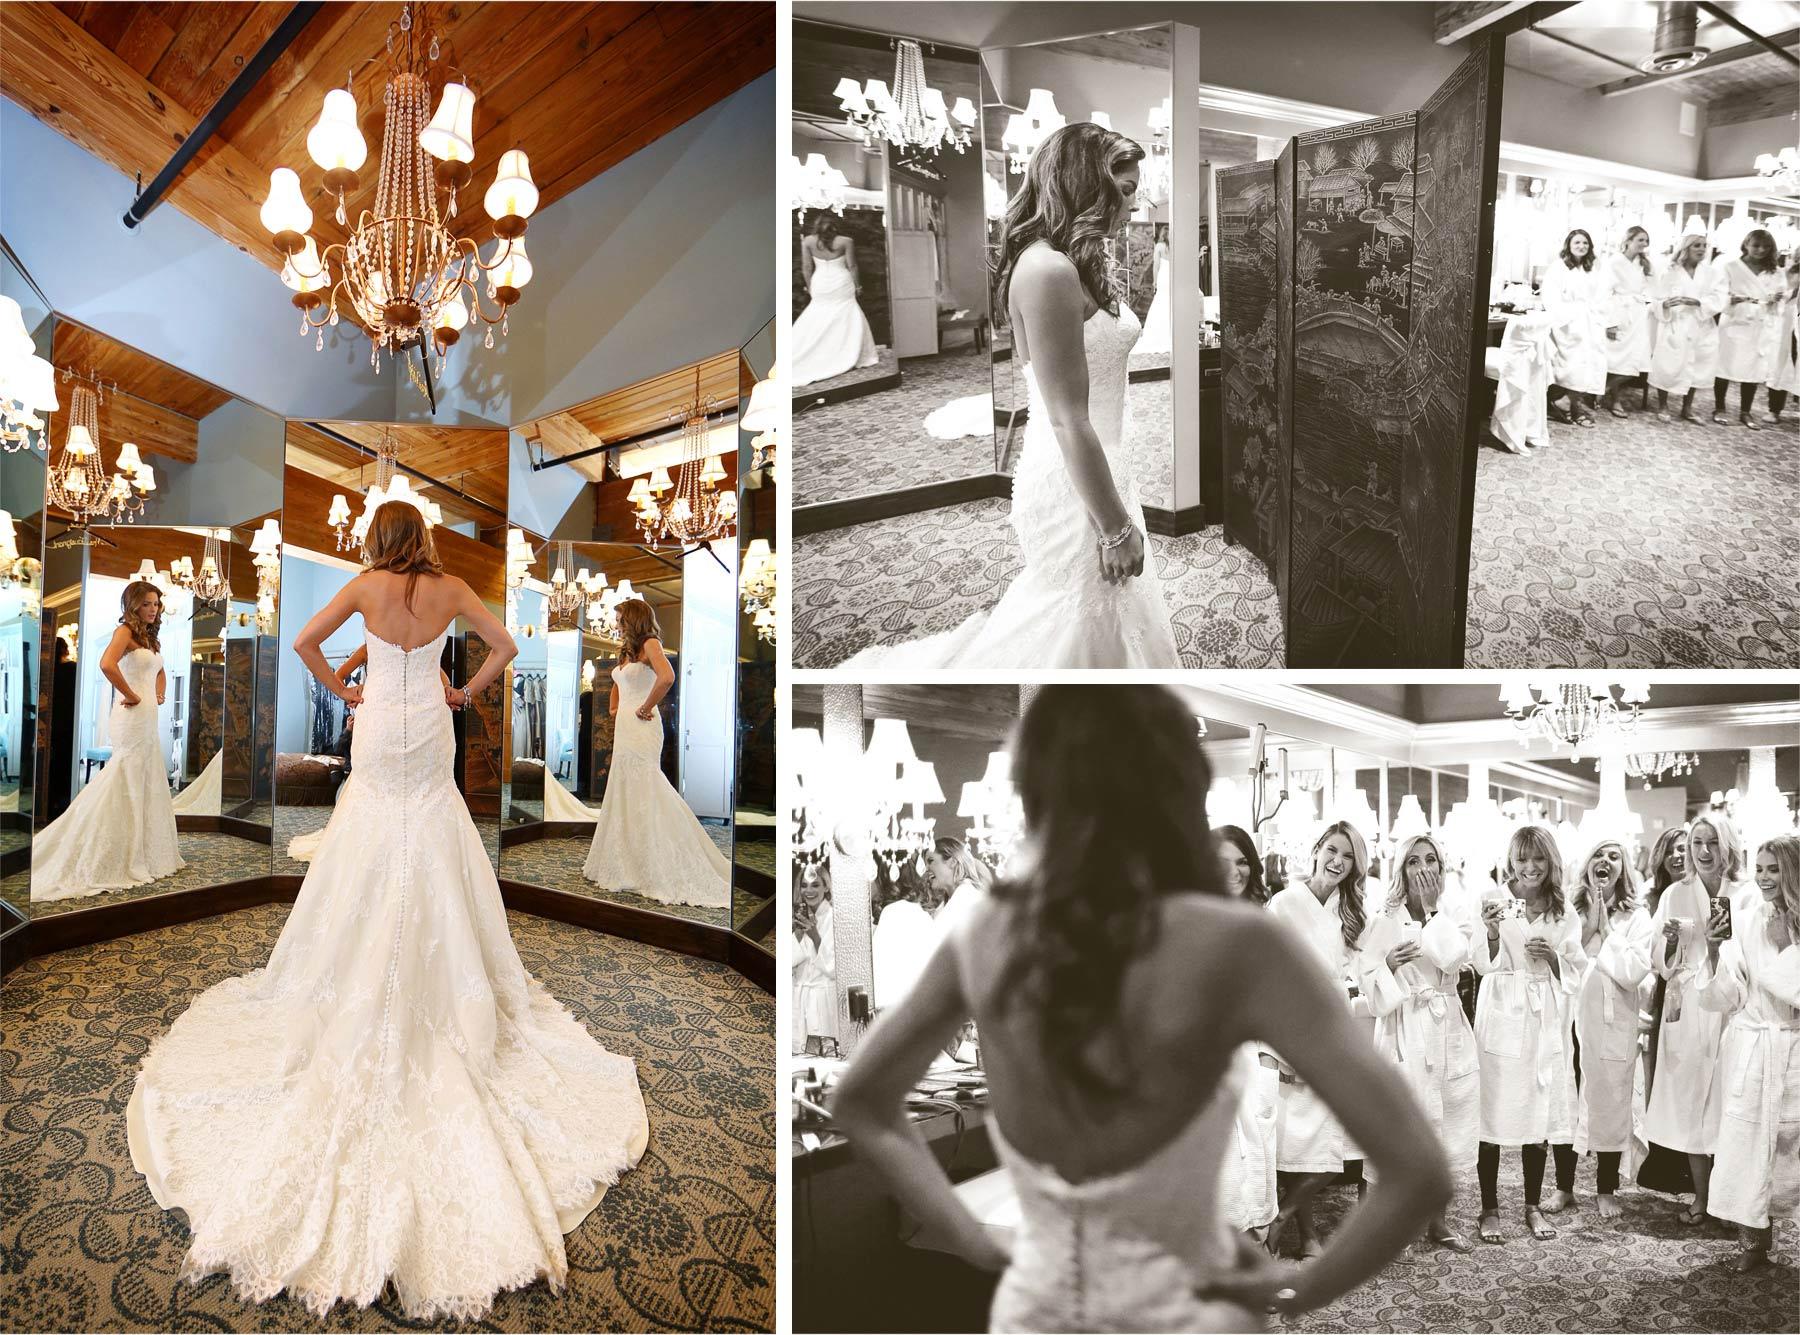 02-Saint-Paul-Minnesota-Wedding-Photographer-by-Andrew-Vick-Photography-Summer-Abulae-Getting-Ready-Bride-Bridesmaids-Dress-Sepia-Molly-and-Dan.jpg